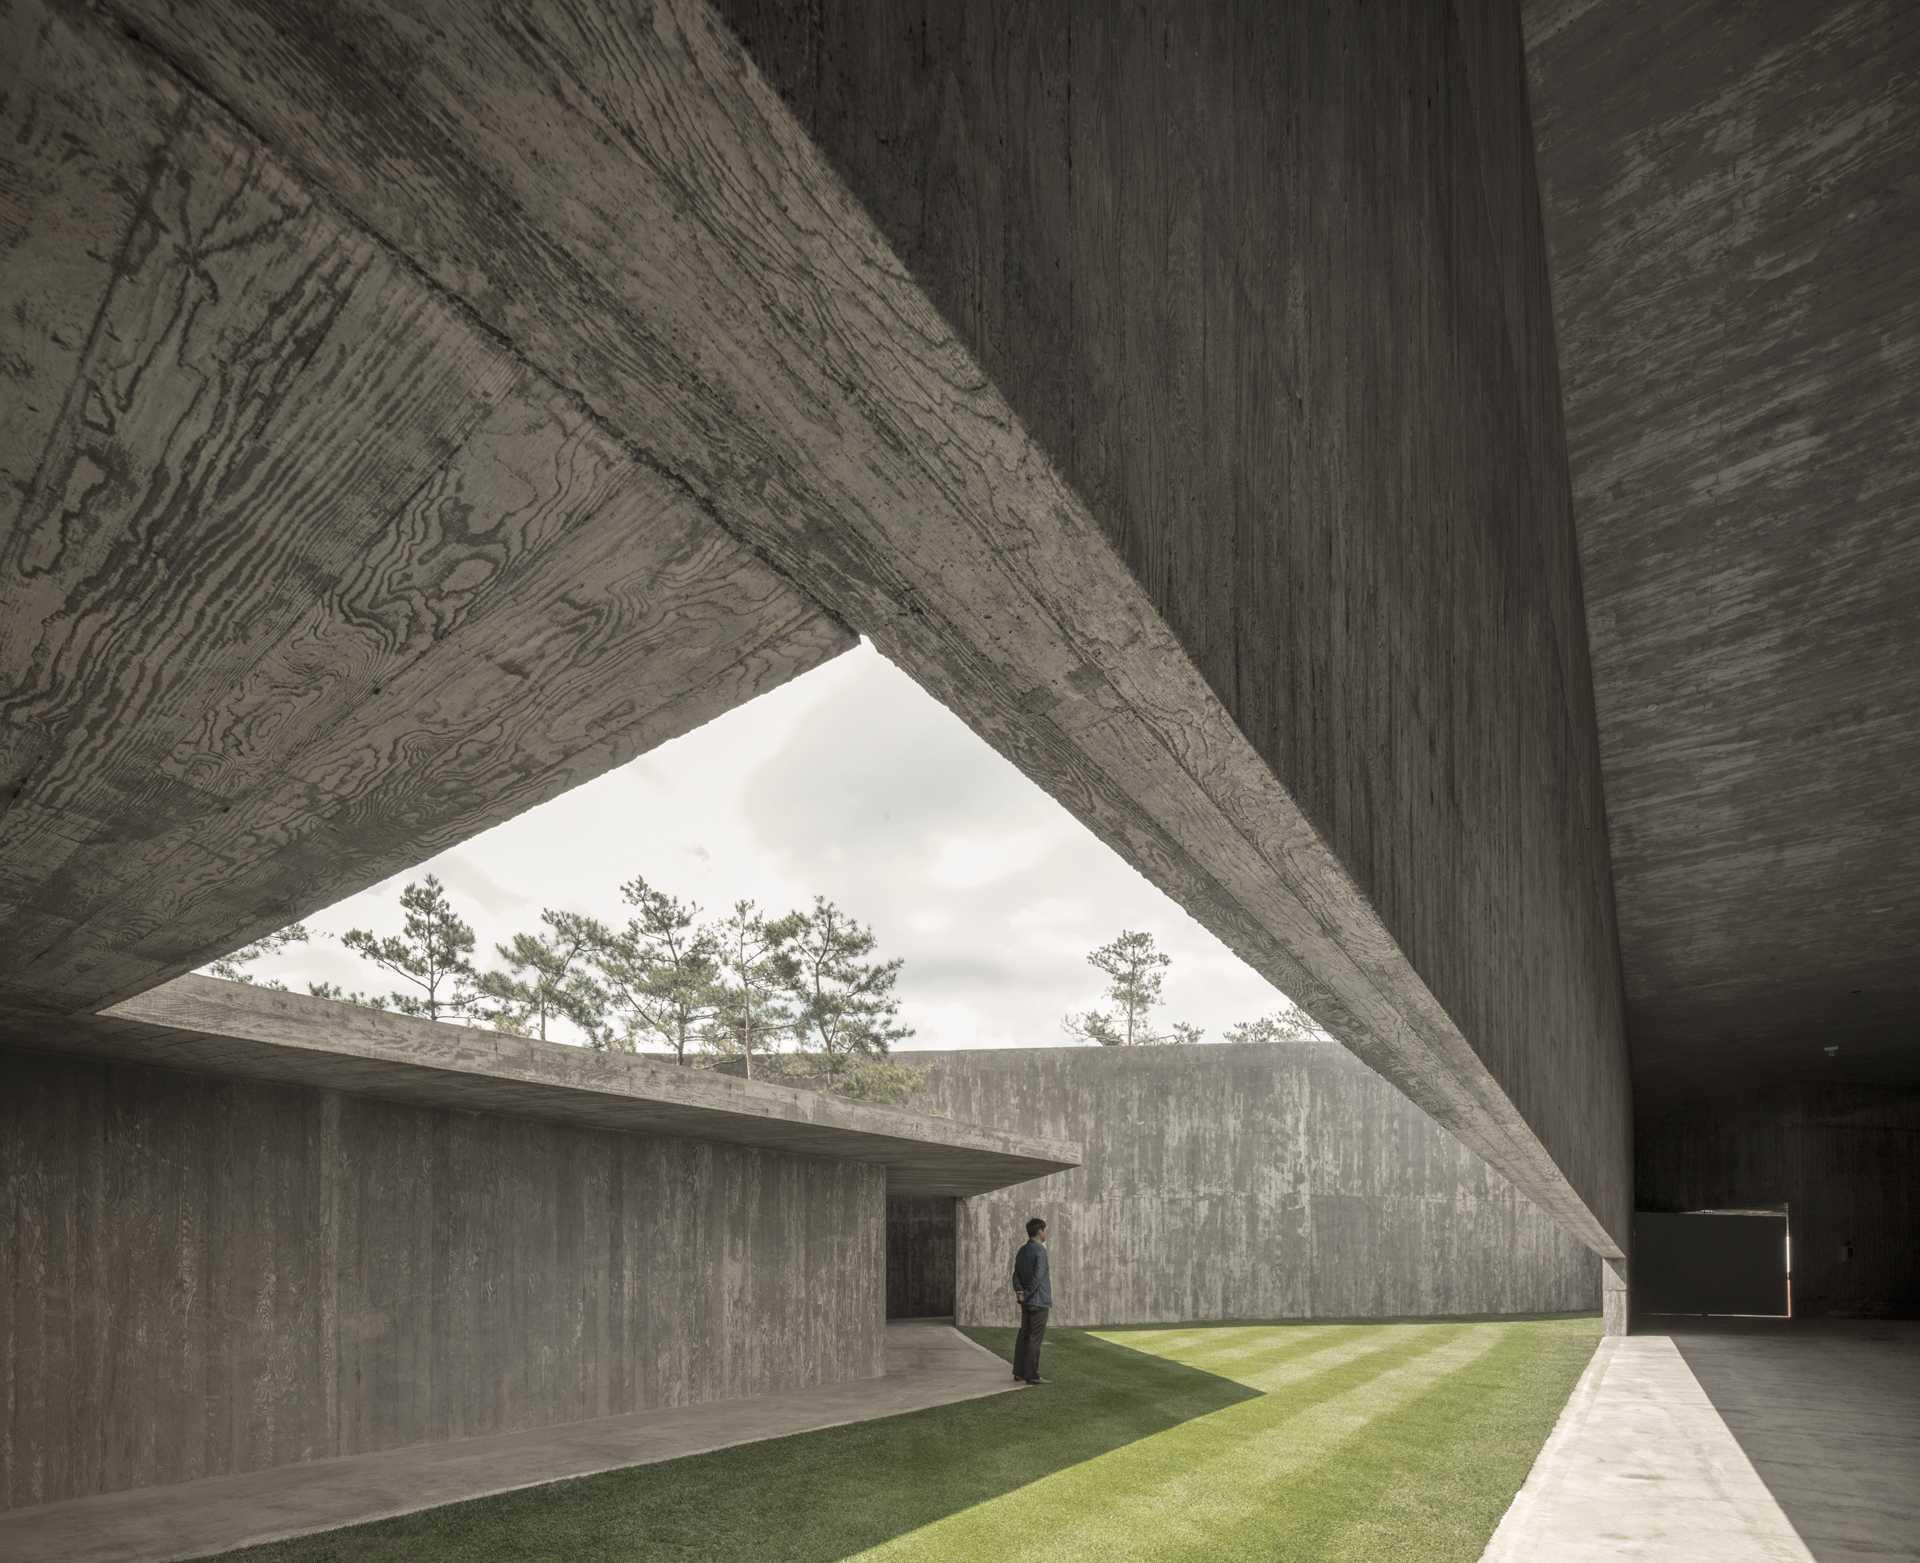 Art Pavilion in Saya Park  - 21 9 48